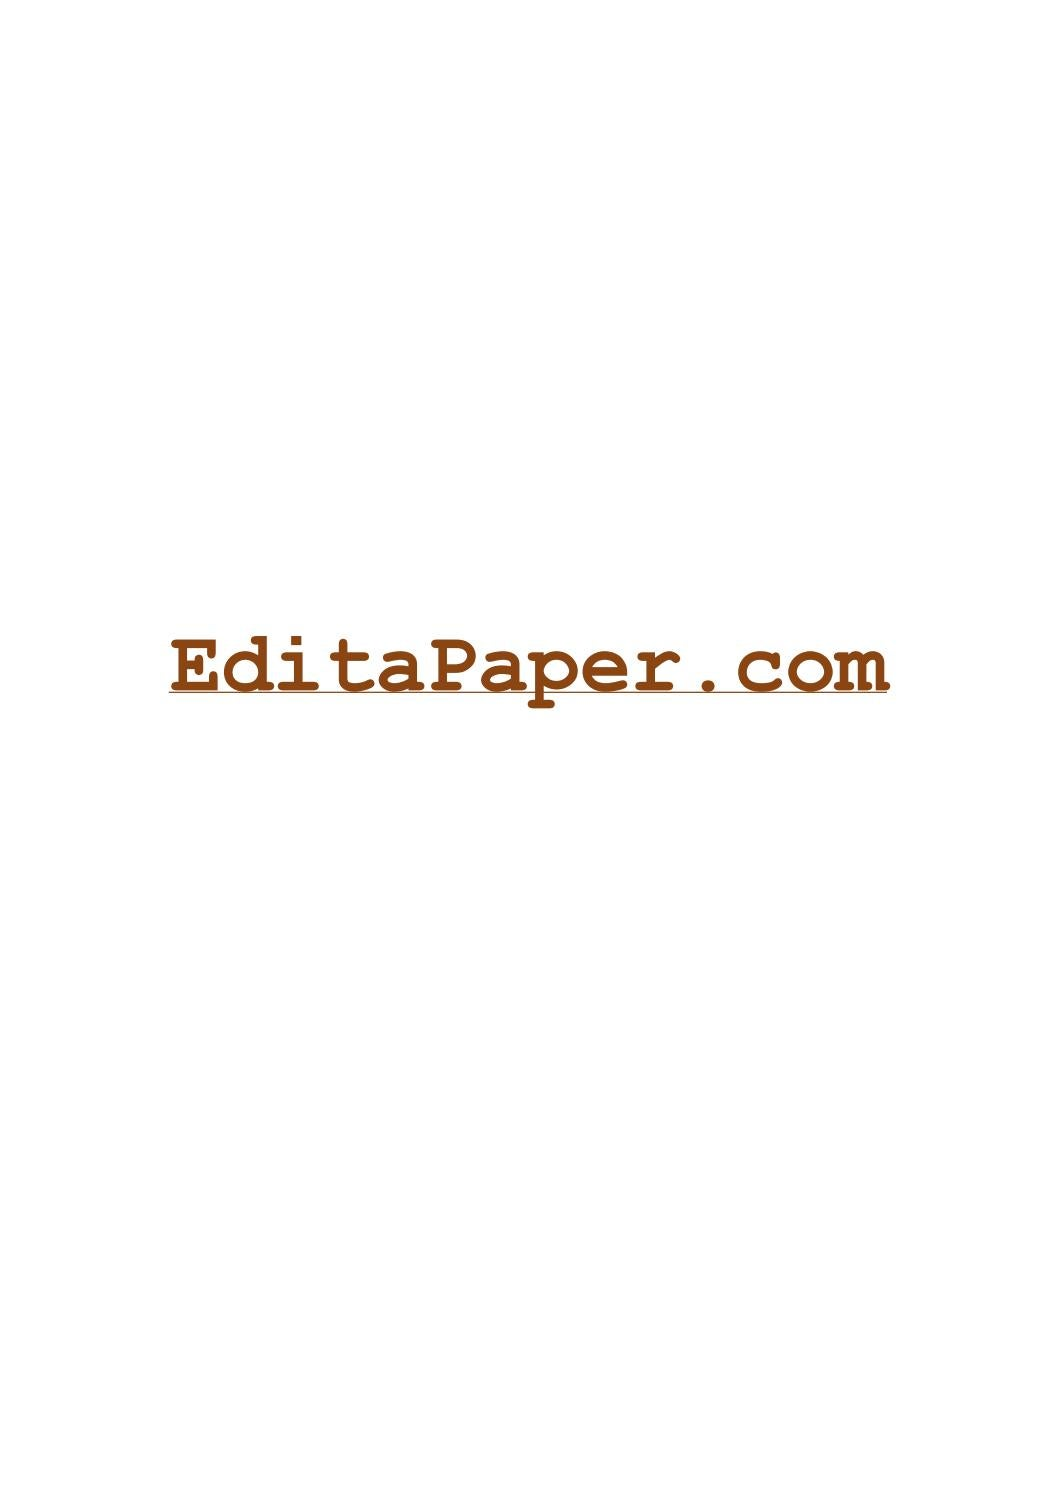 Best essays ghostwriting service usa